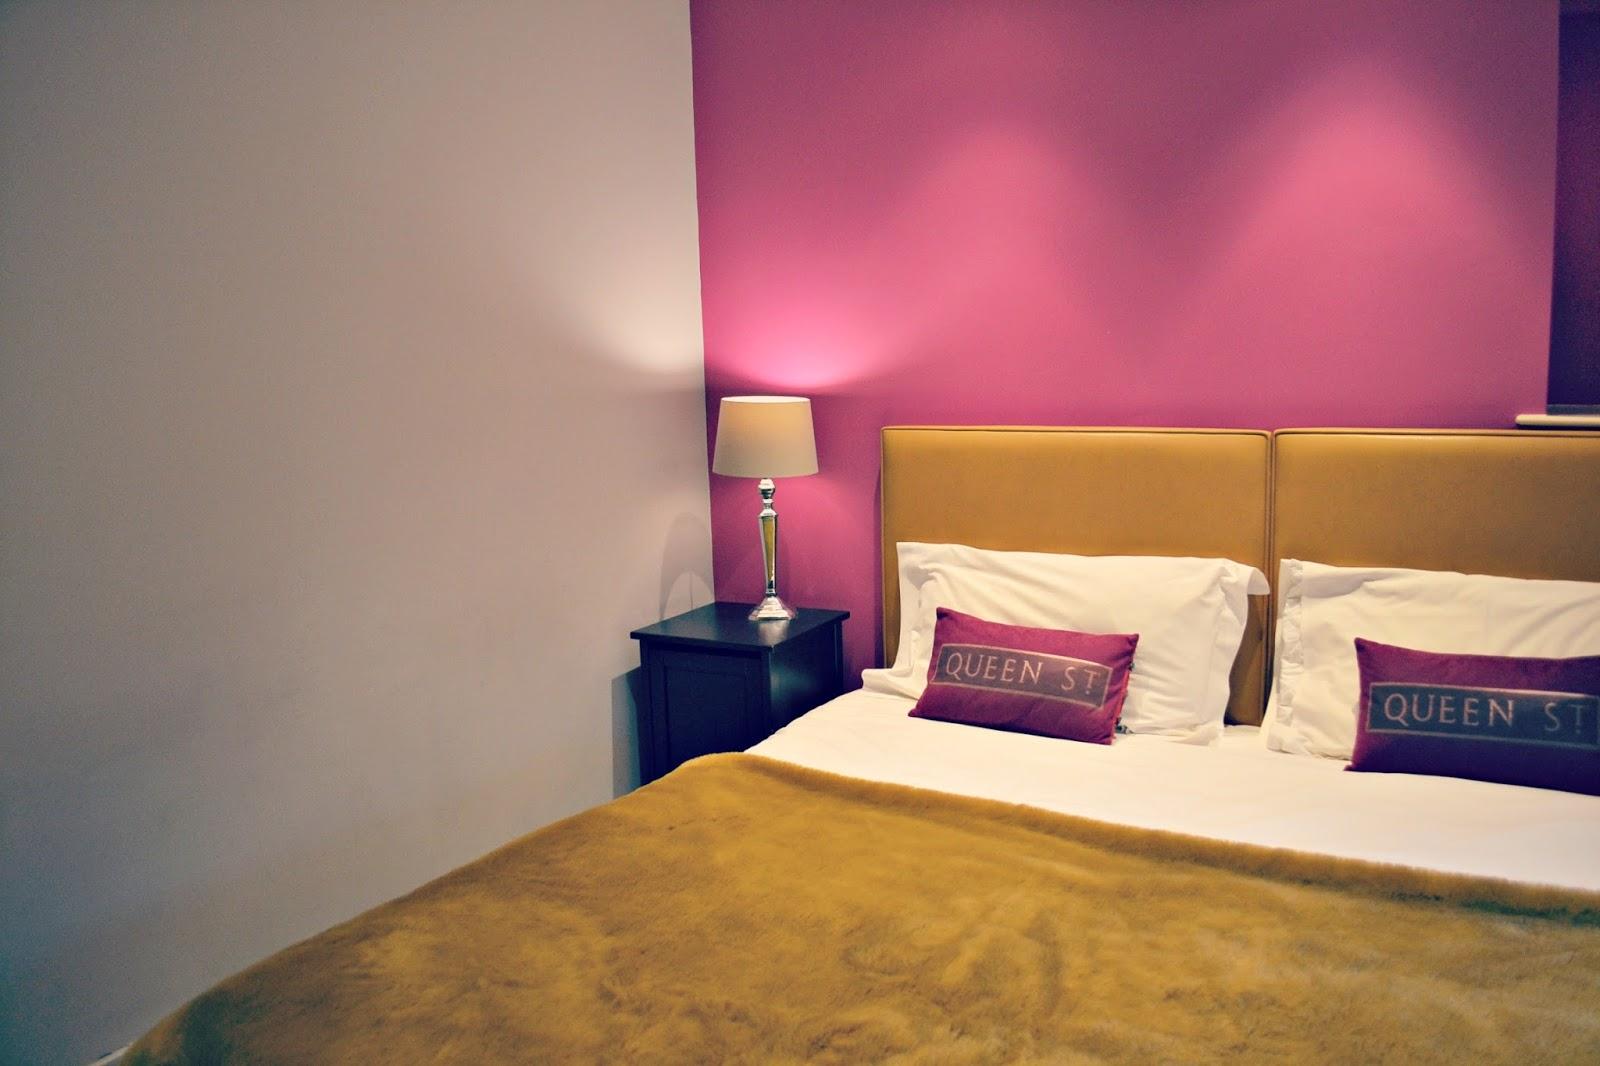 Harington House Bath UK hotel and spa room